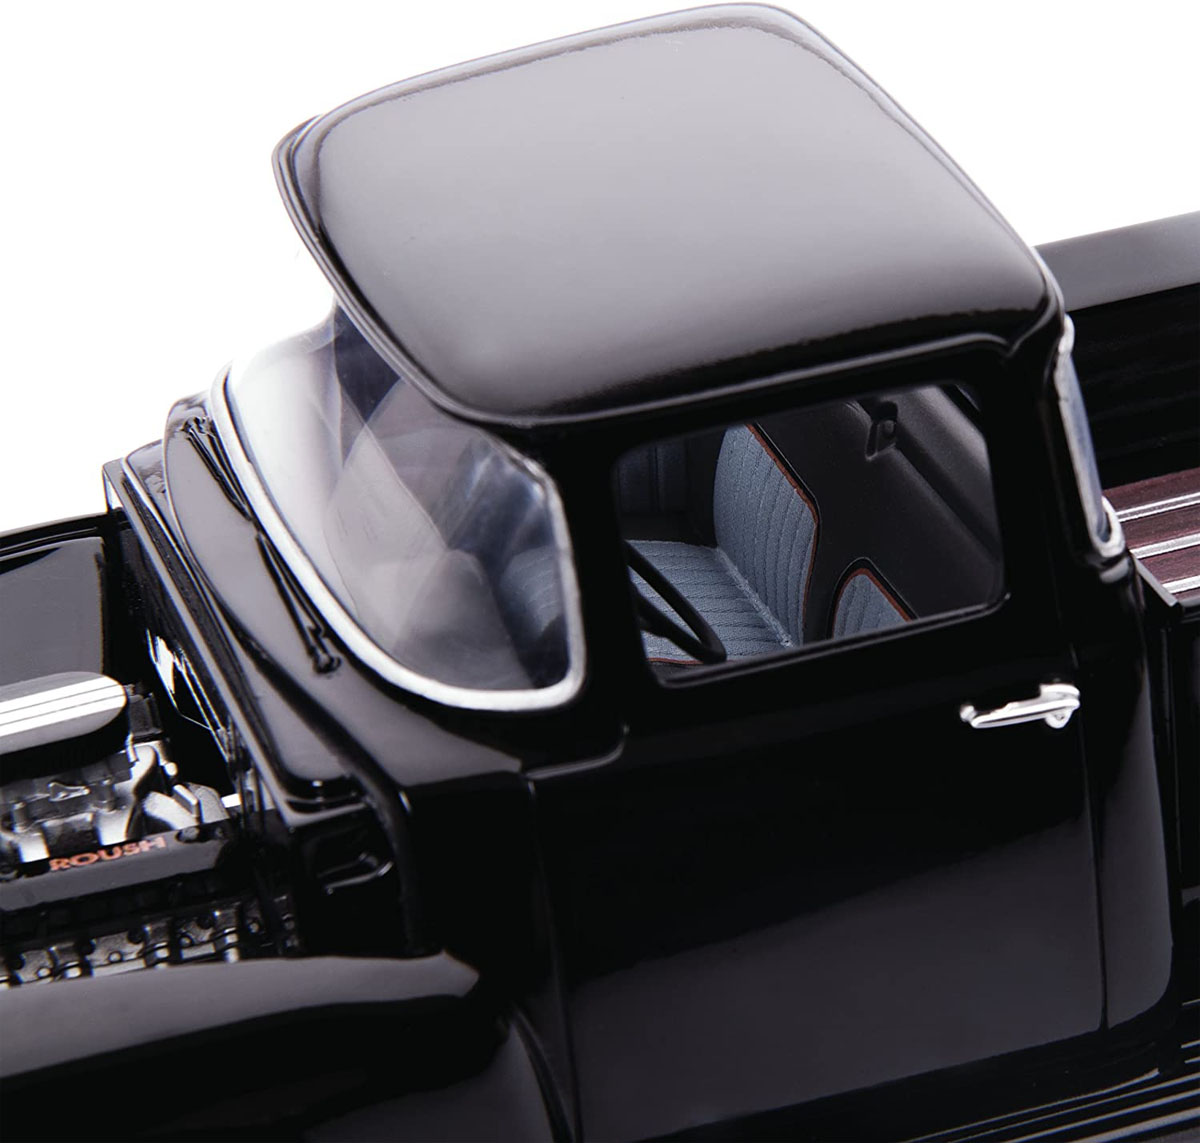 Foose Ford FD-100 Pickup - 1/25 - Revell 85-4426  - BLIMPS COMÉRCIO ELETRÔNICO